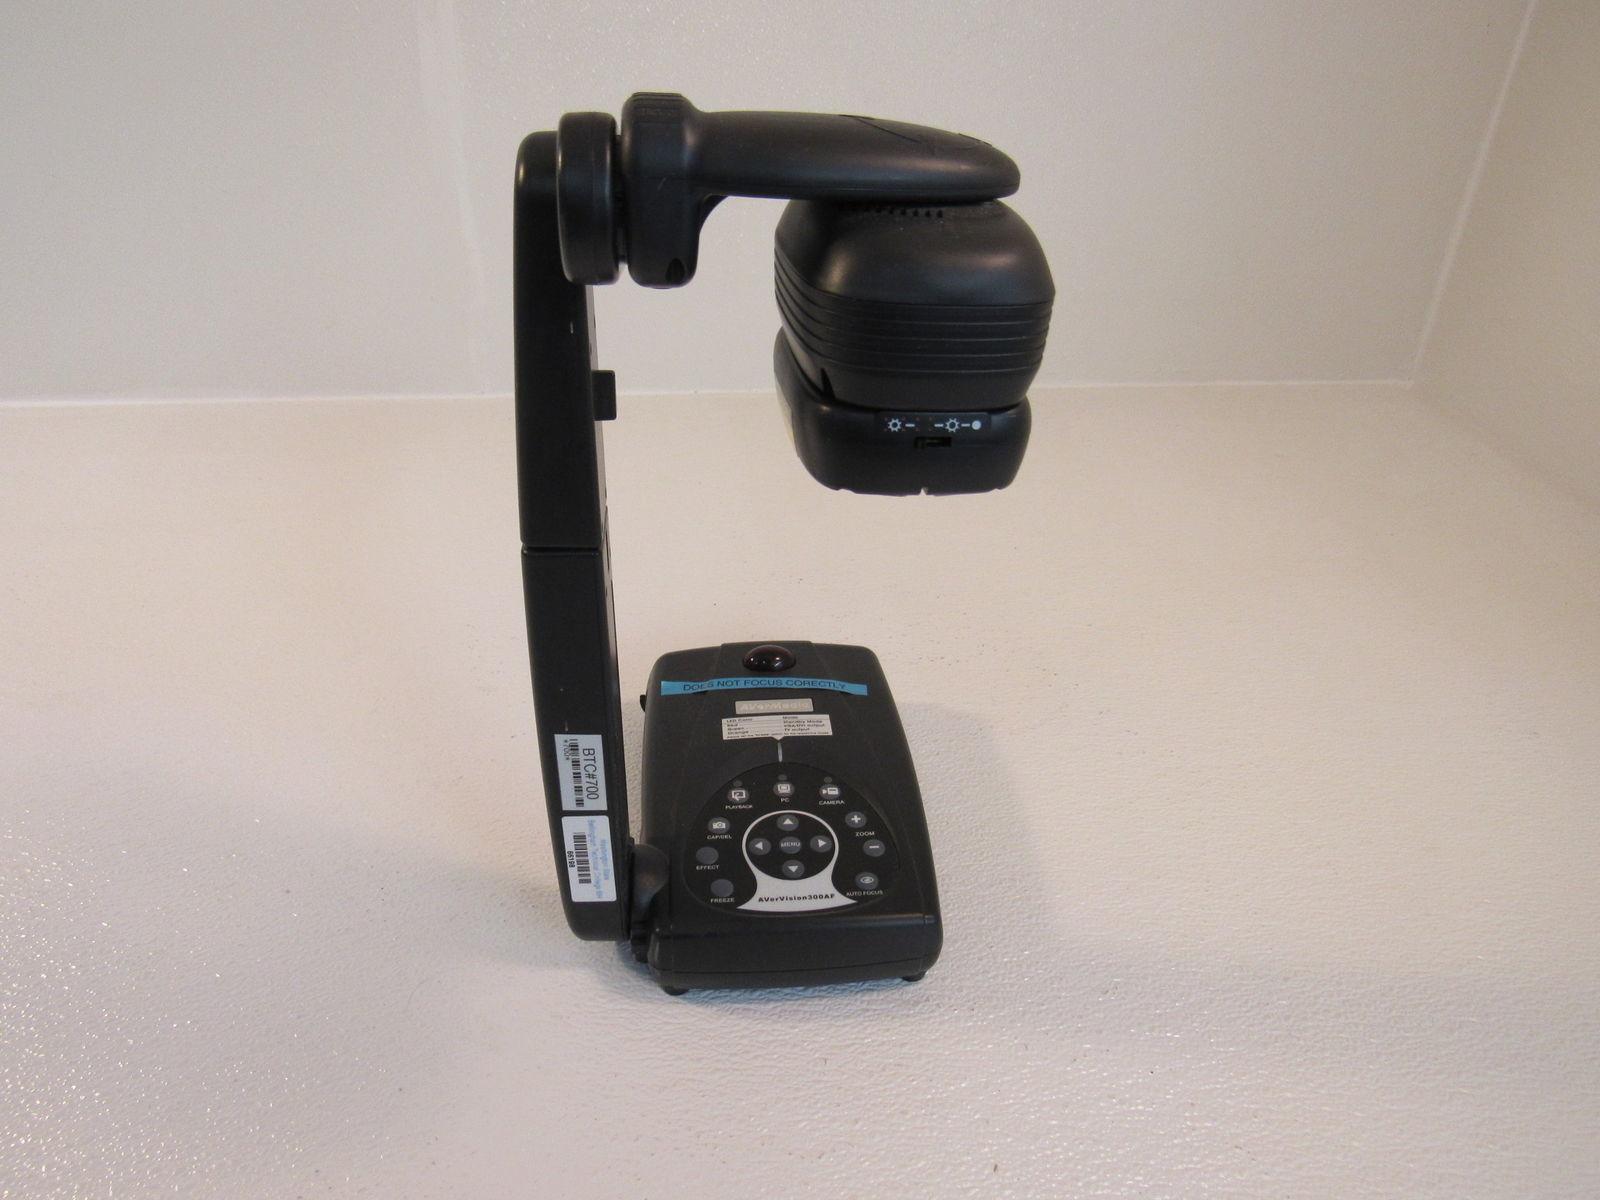 AverMedia Document Camera AverVision 3.2MP Black 300AF